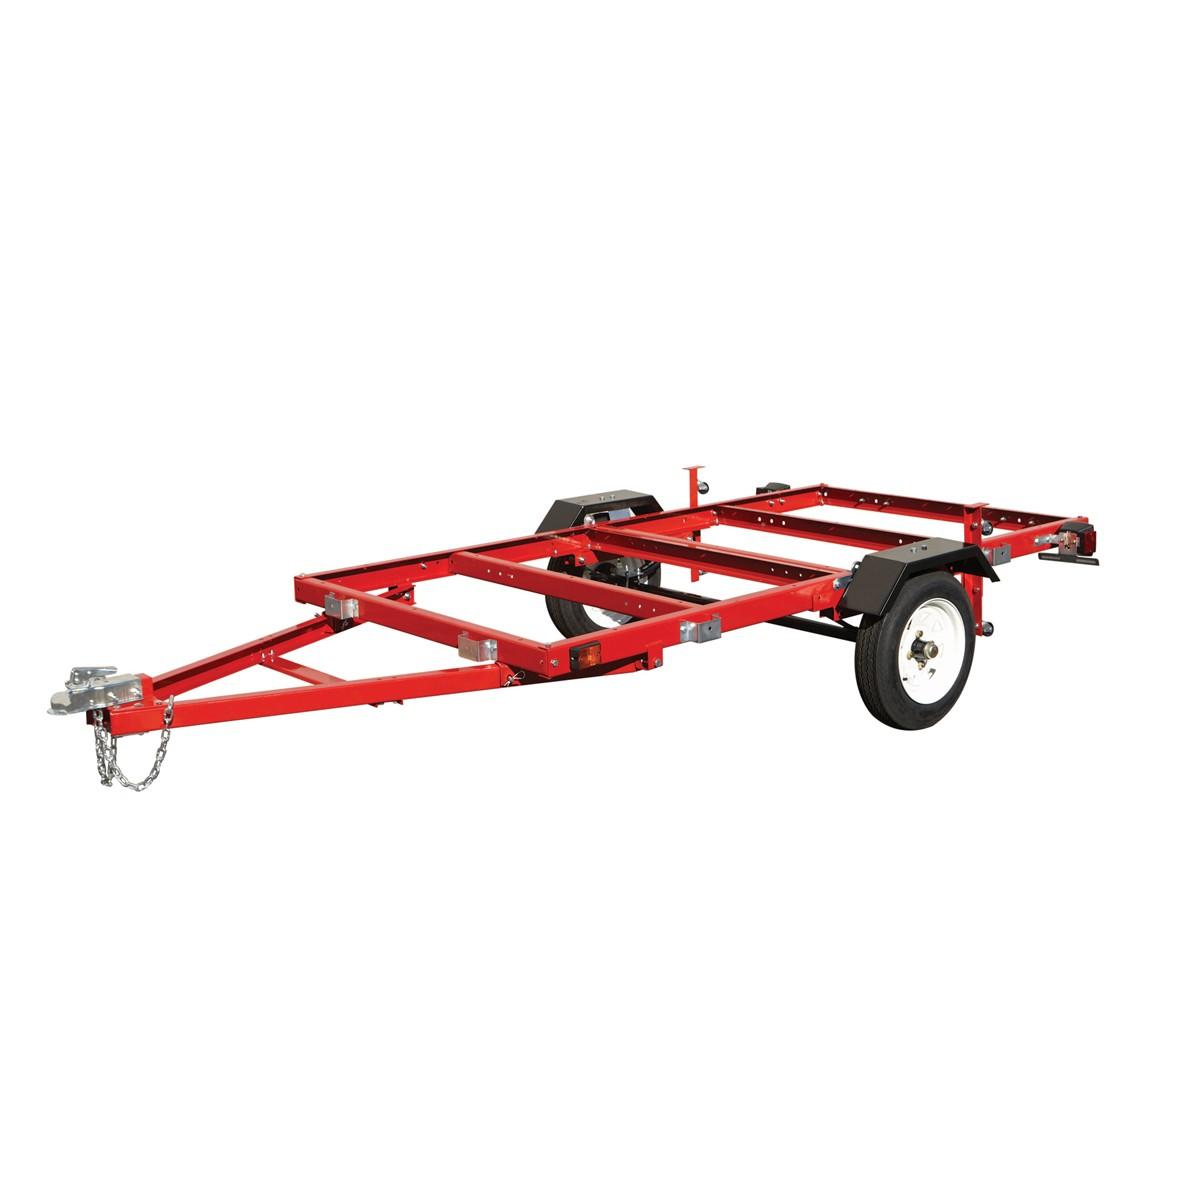 welcome to helluvacook com big pig rig trailer upgrade 2013 big pig rig trailer upgrade 2013